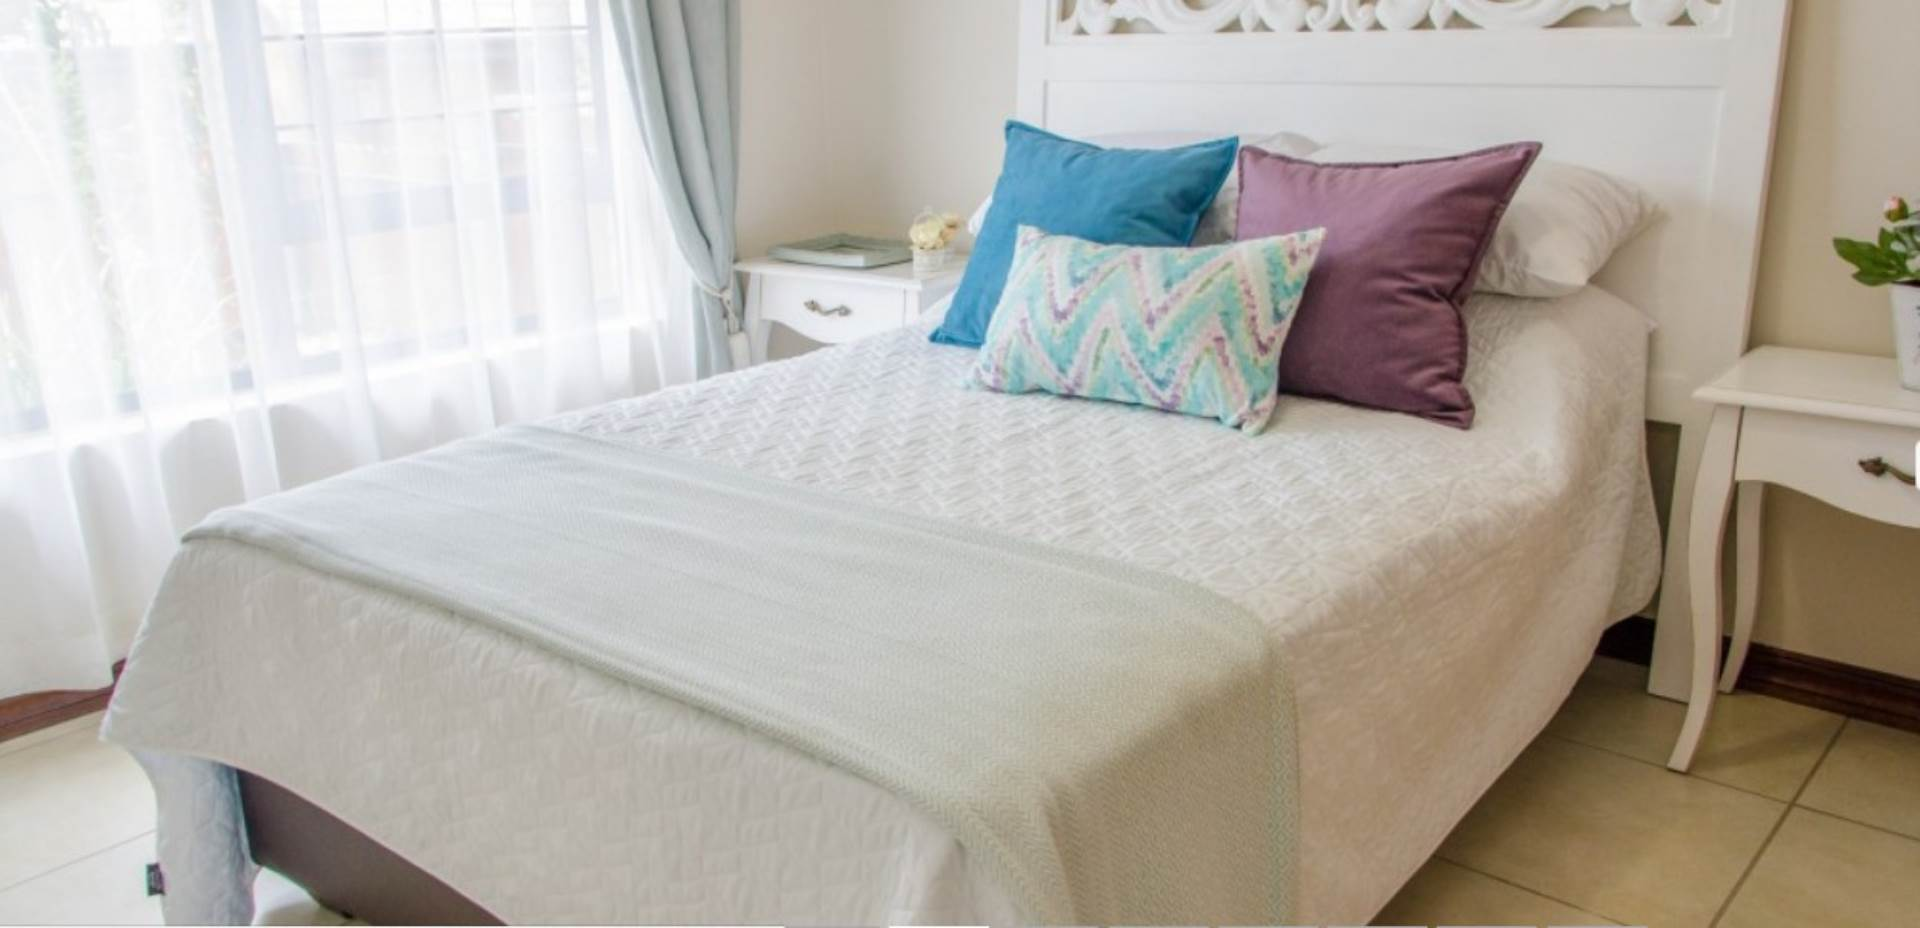 1 Bedroom Retirement Village in Olympus, Pretoria For Sale for R 945,000  #1097150